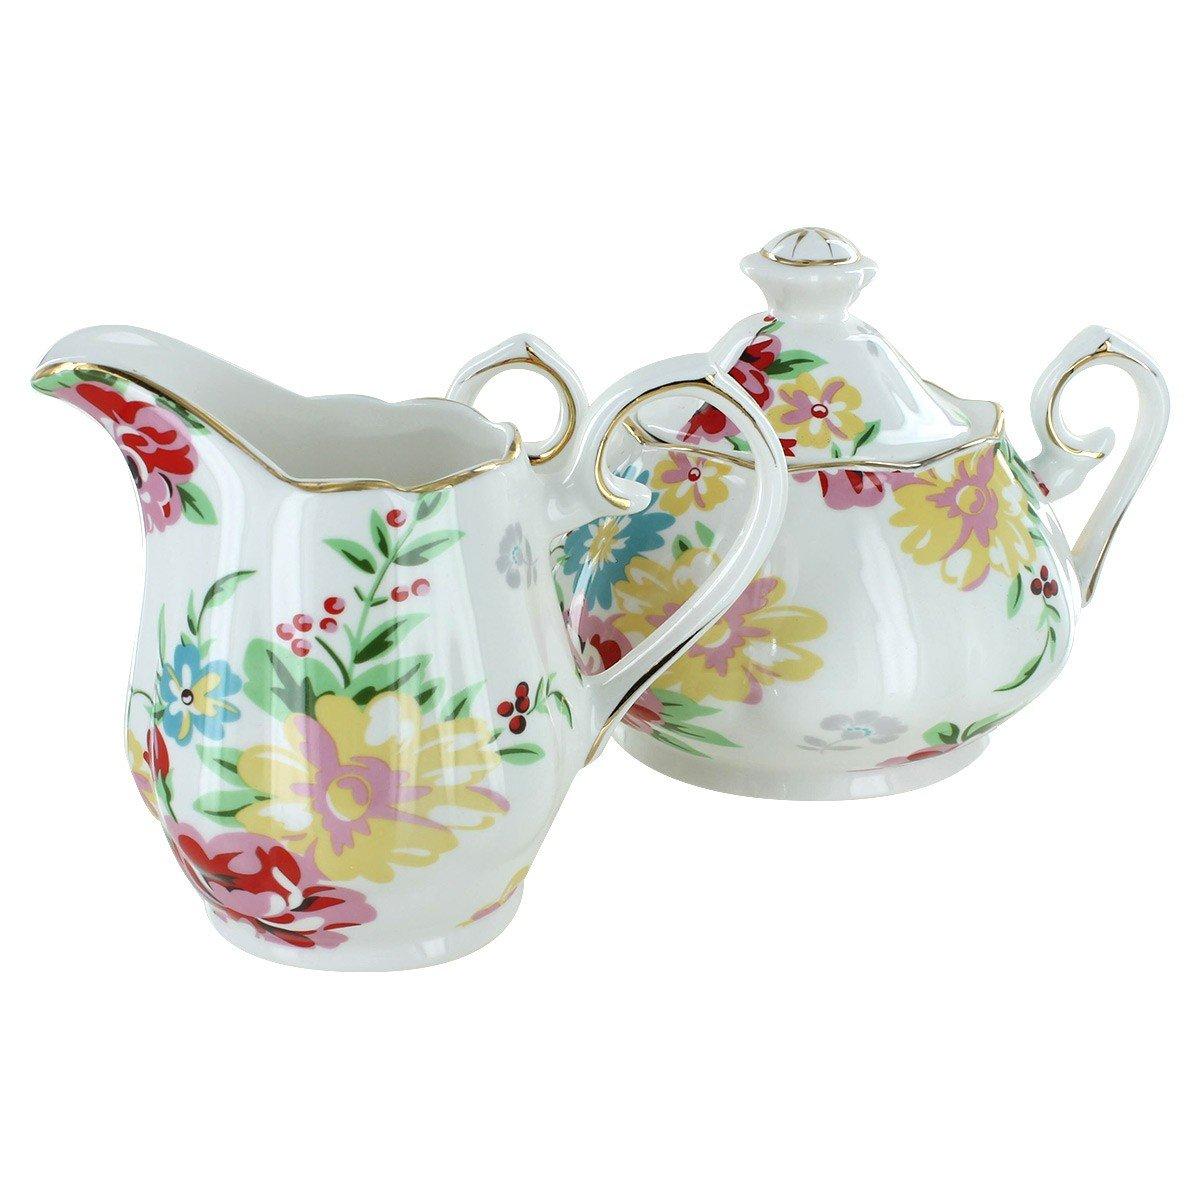 Shabby Rose Cream Porcelain - Sugar and Creamer Set